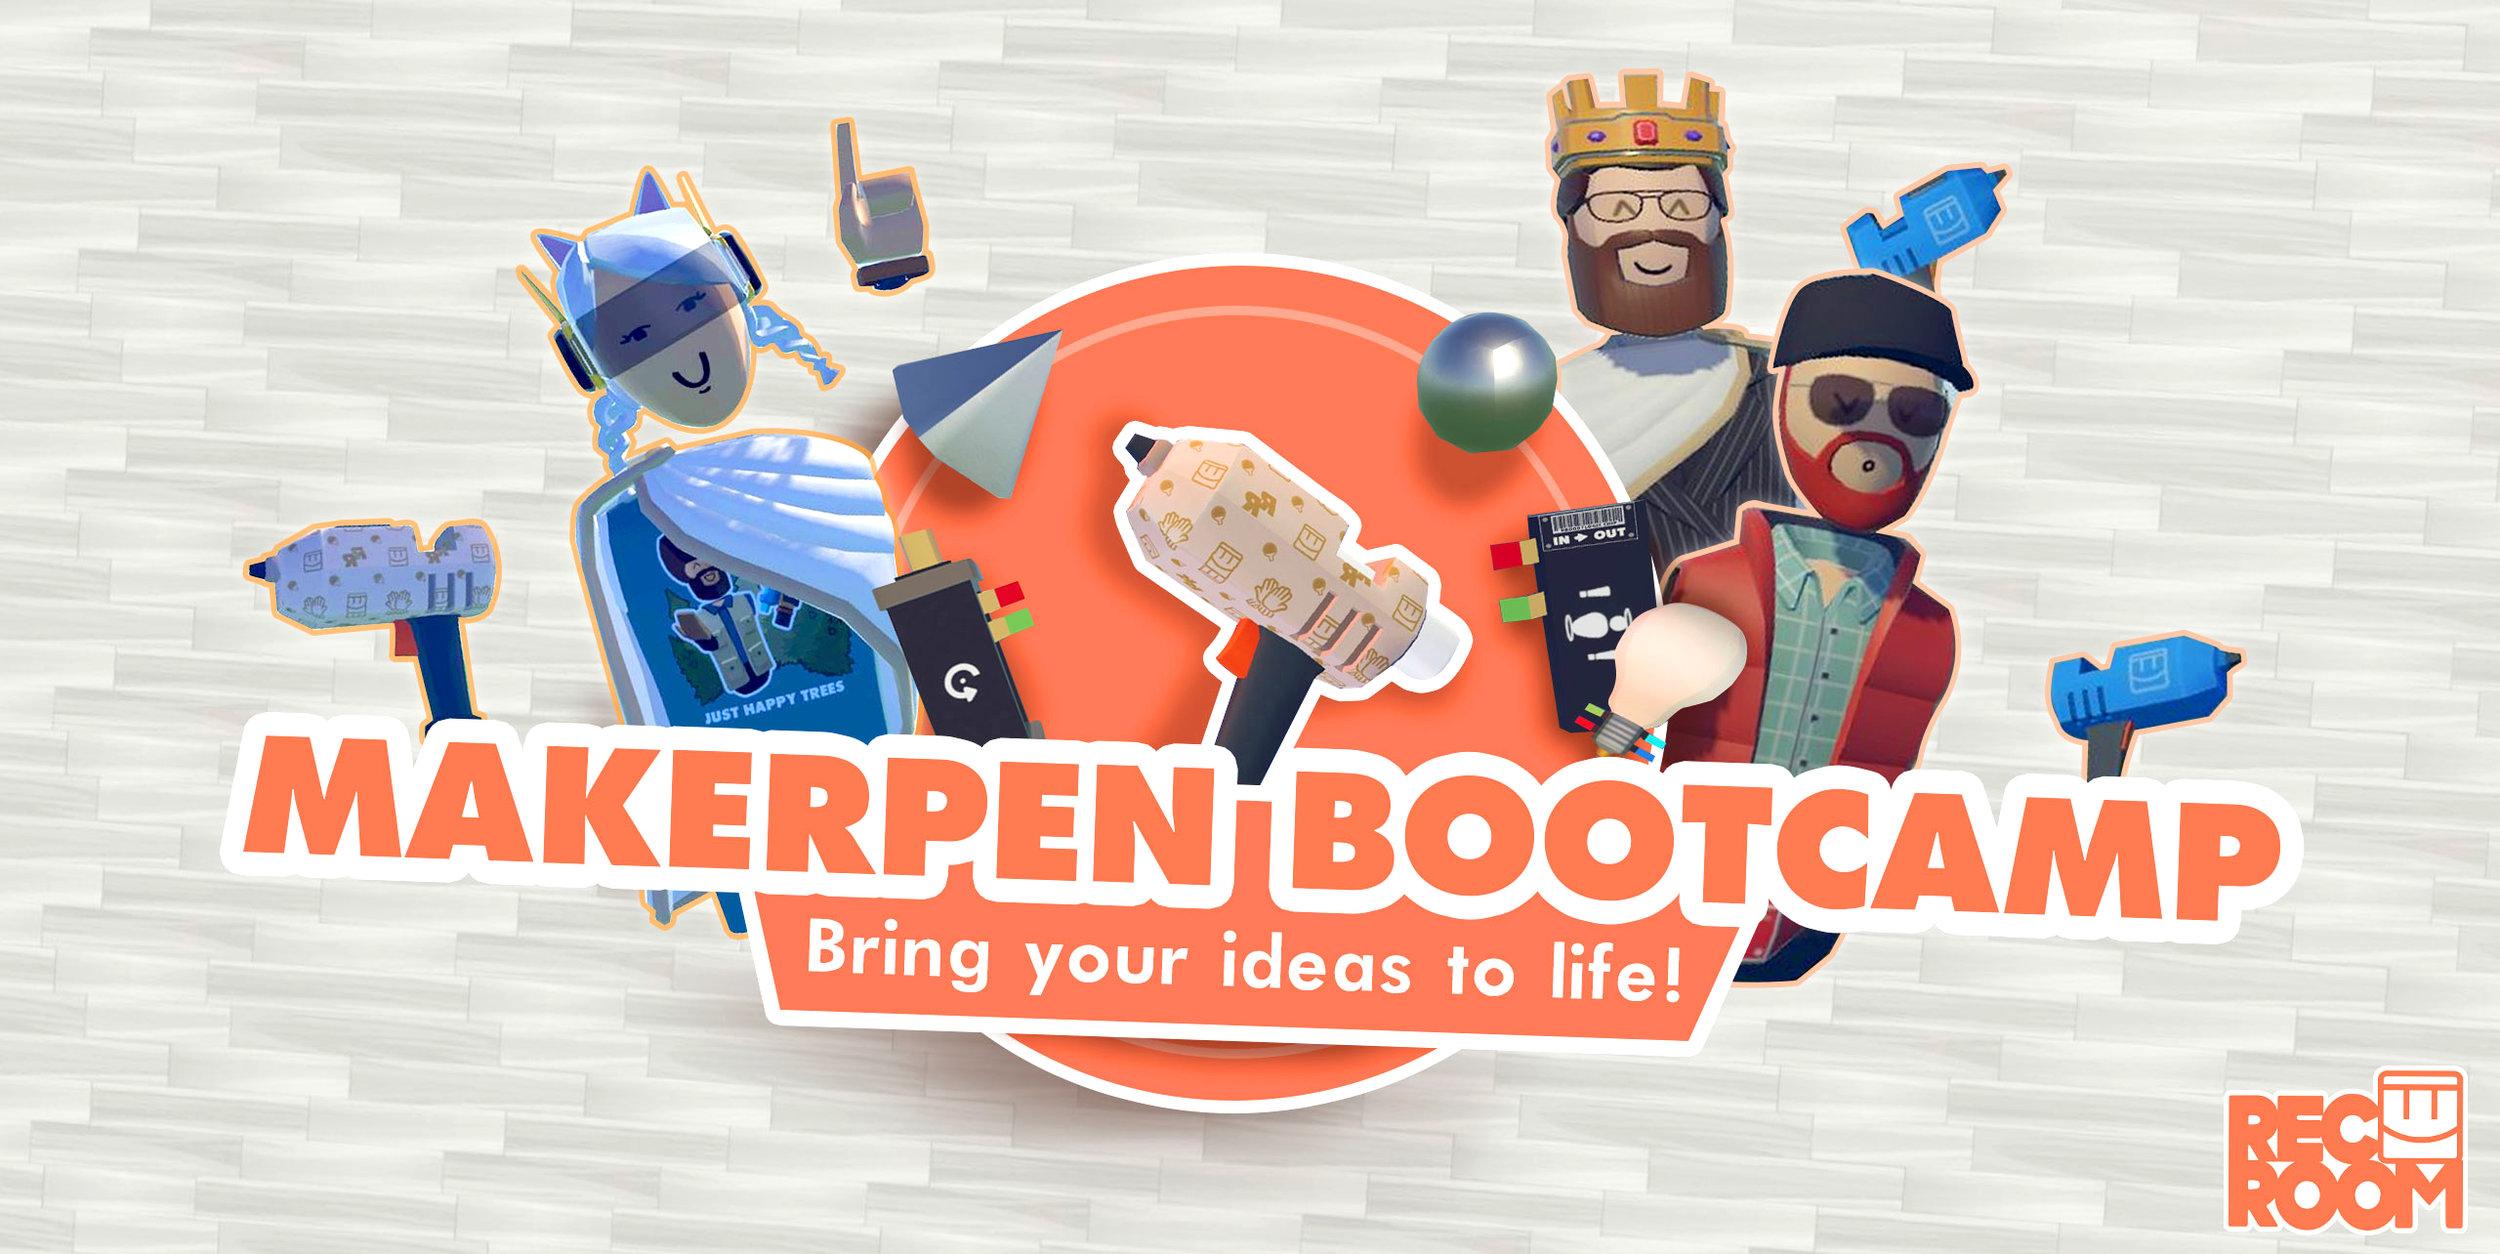 MakerPenBootcamp_Image.jpg